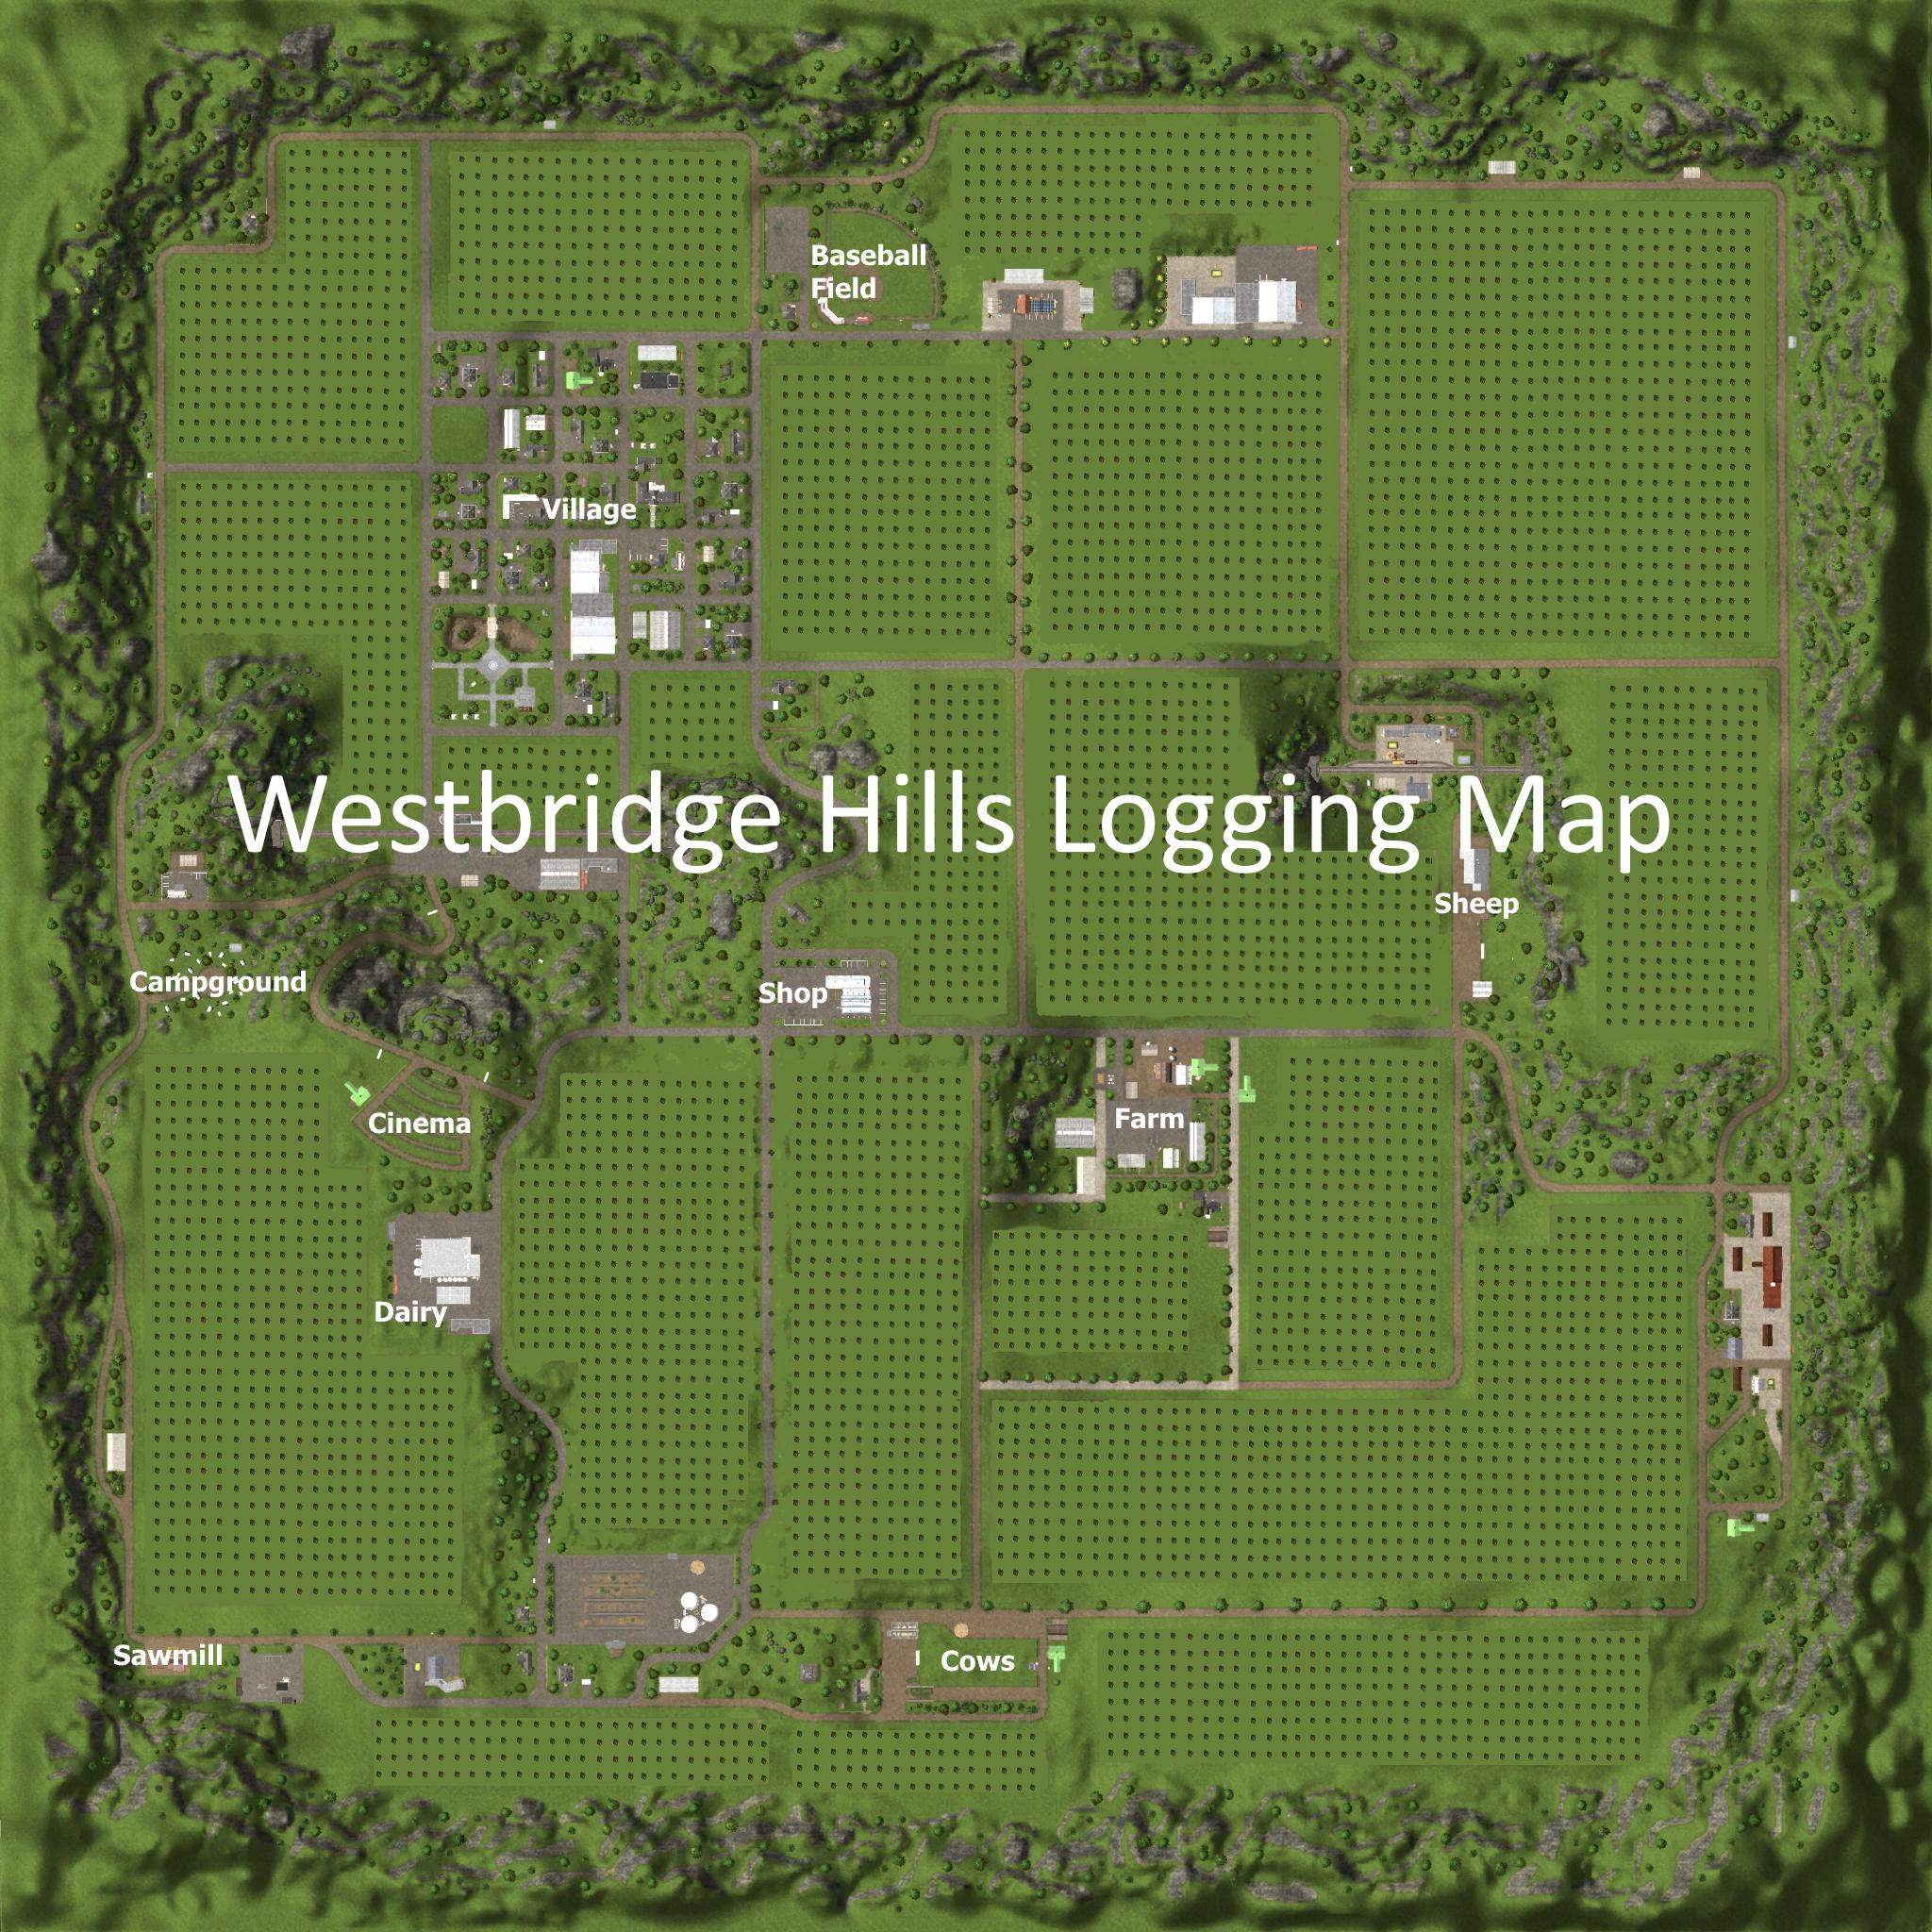 WESTBRIDGE HILLS LOGGING For FS 15 - Farming simulator 2019 / 2017